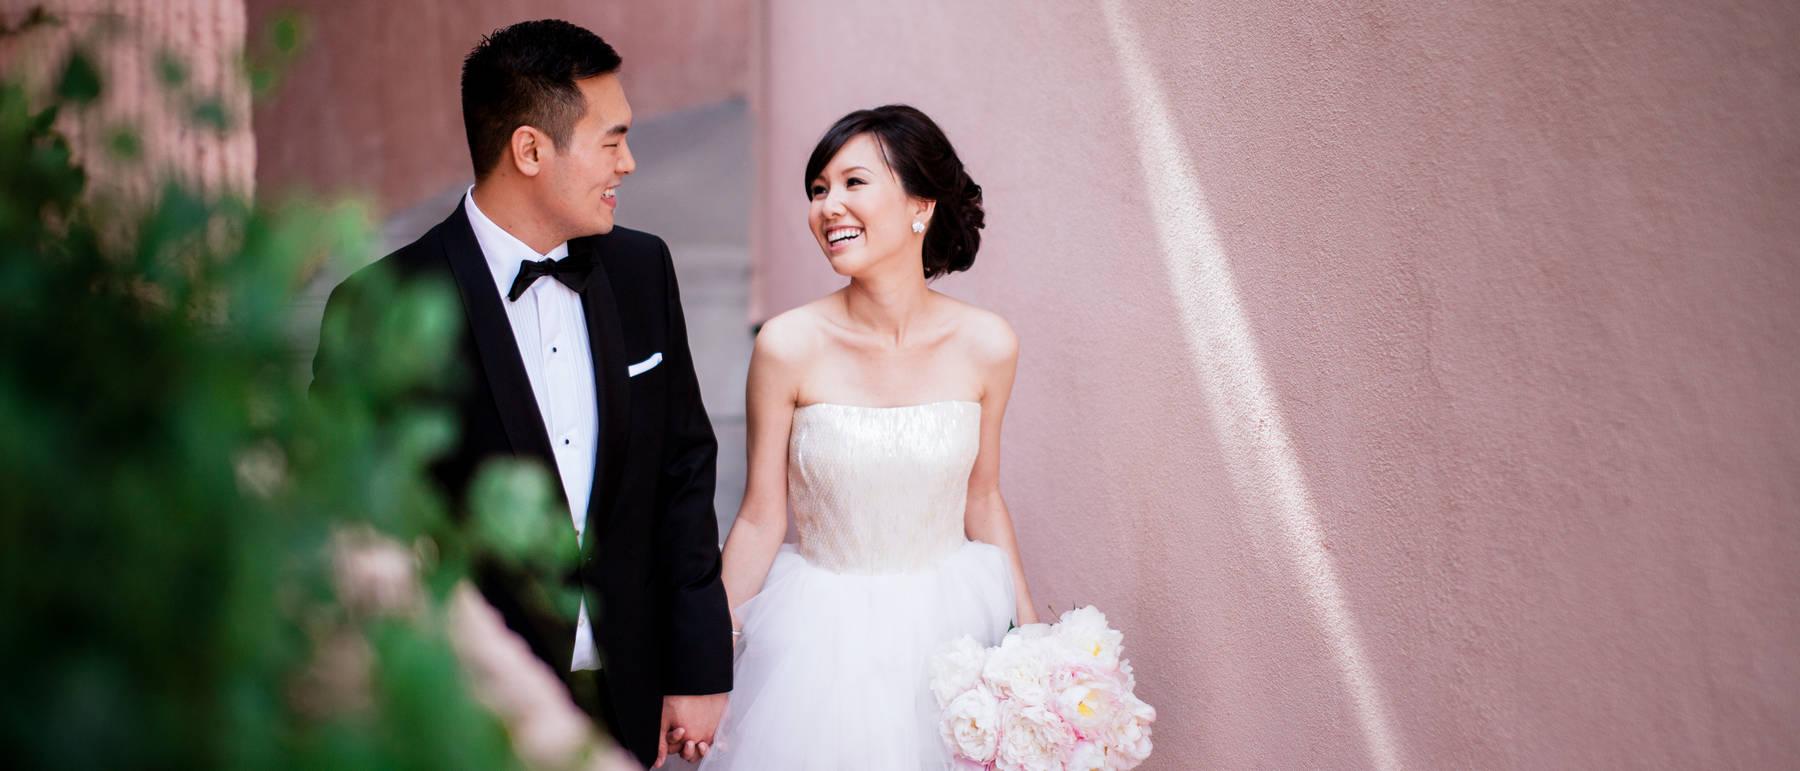 johnandjoseph-wedding-photographer-hz-slider-169